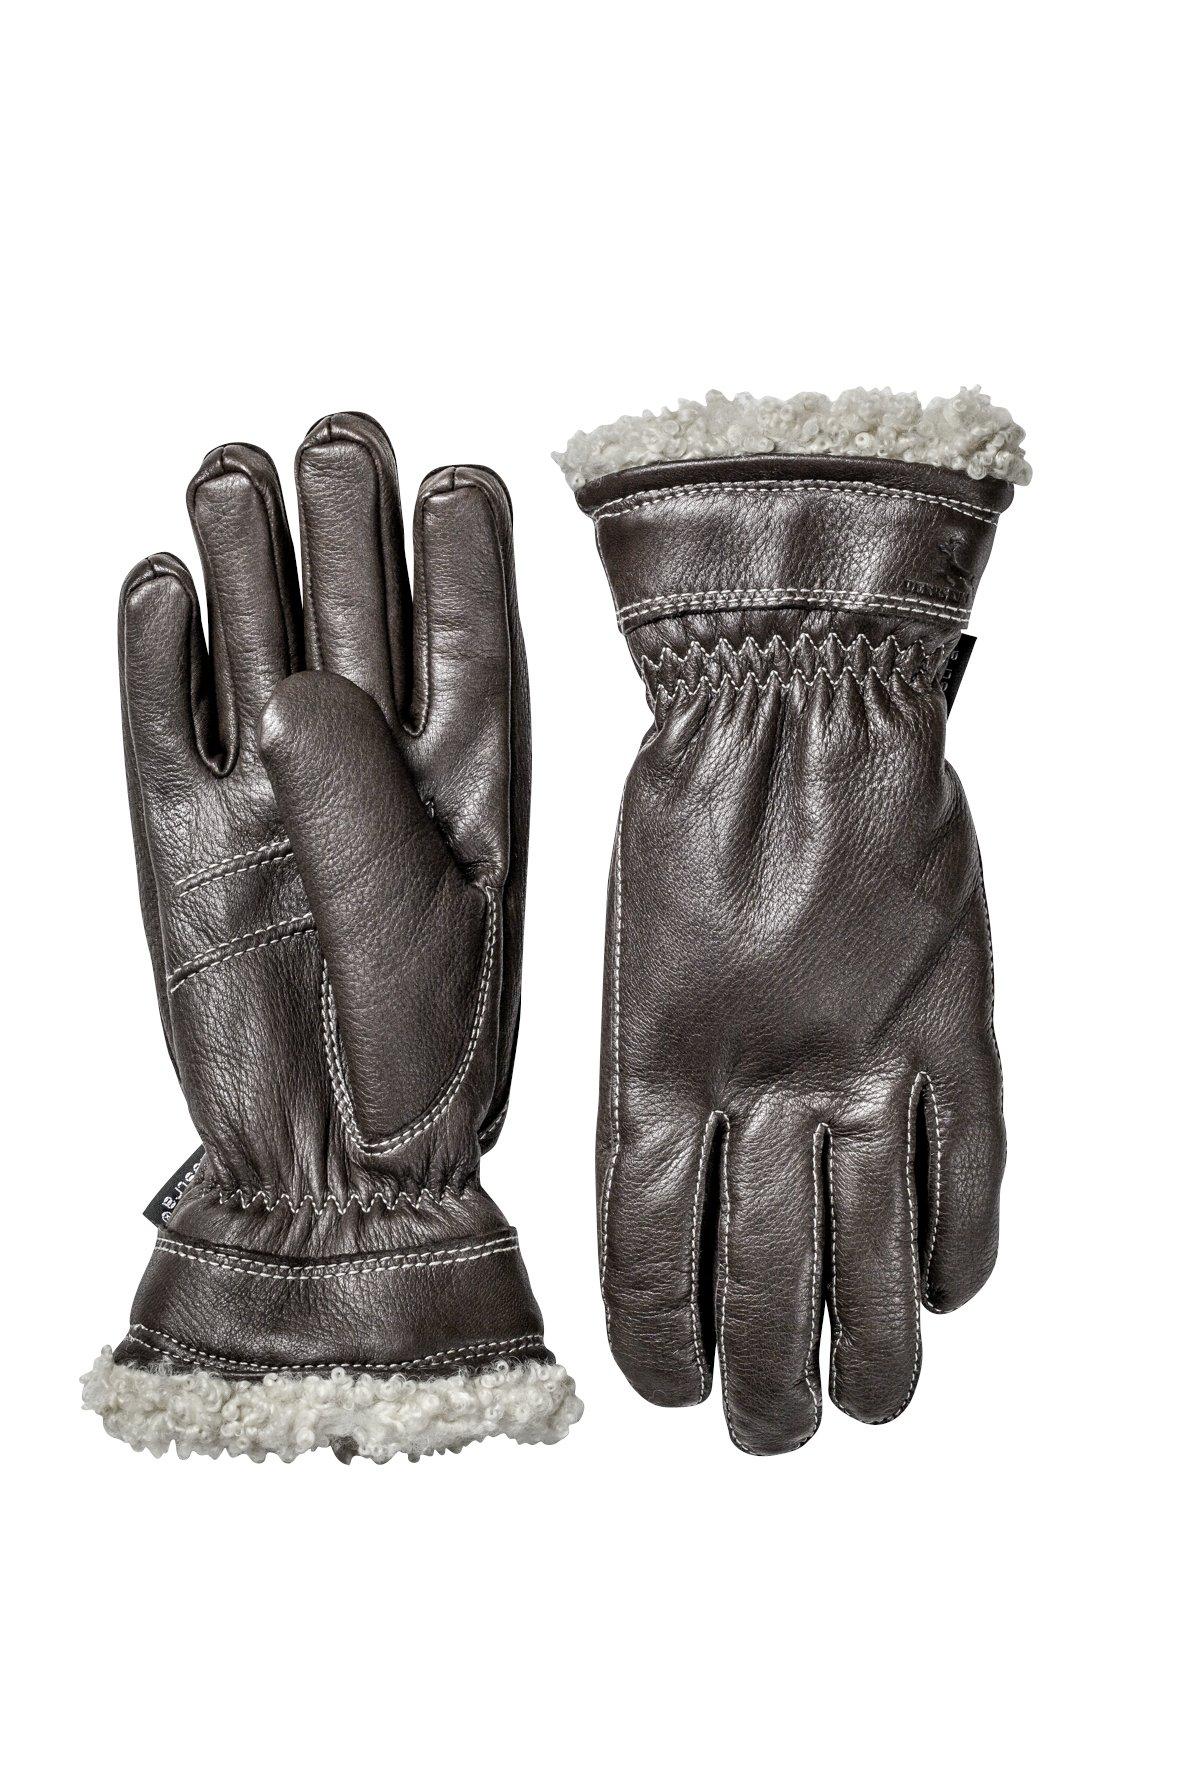 Hestra Deerskin Primaloft Leather Driving Gloves,Dark brown,7